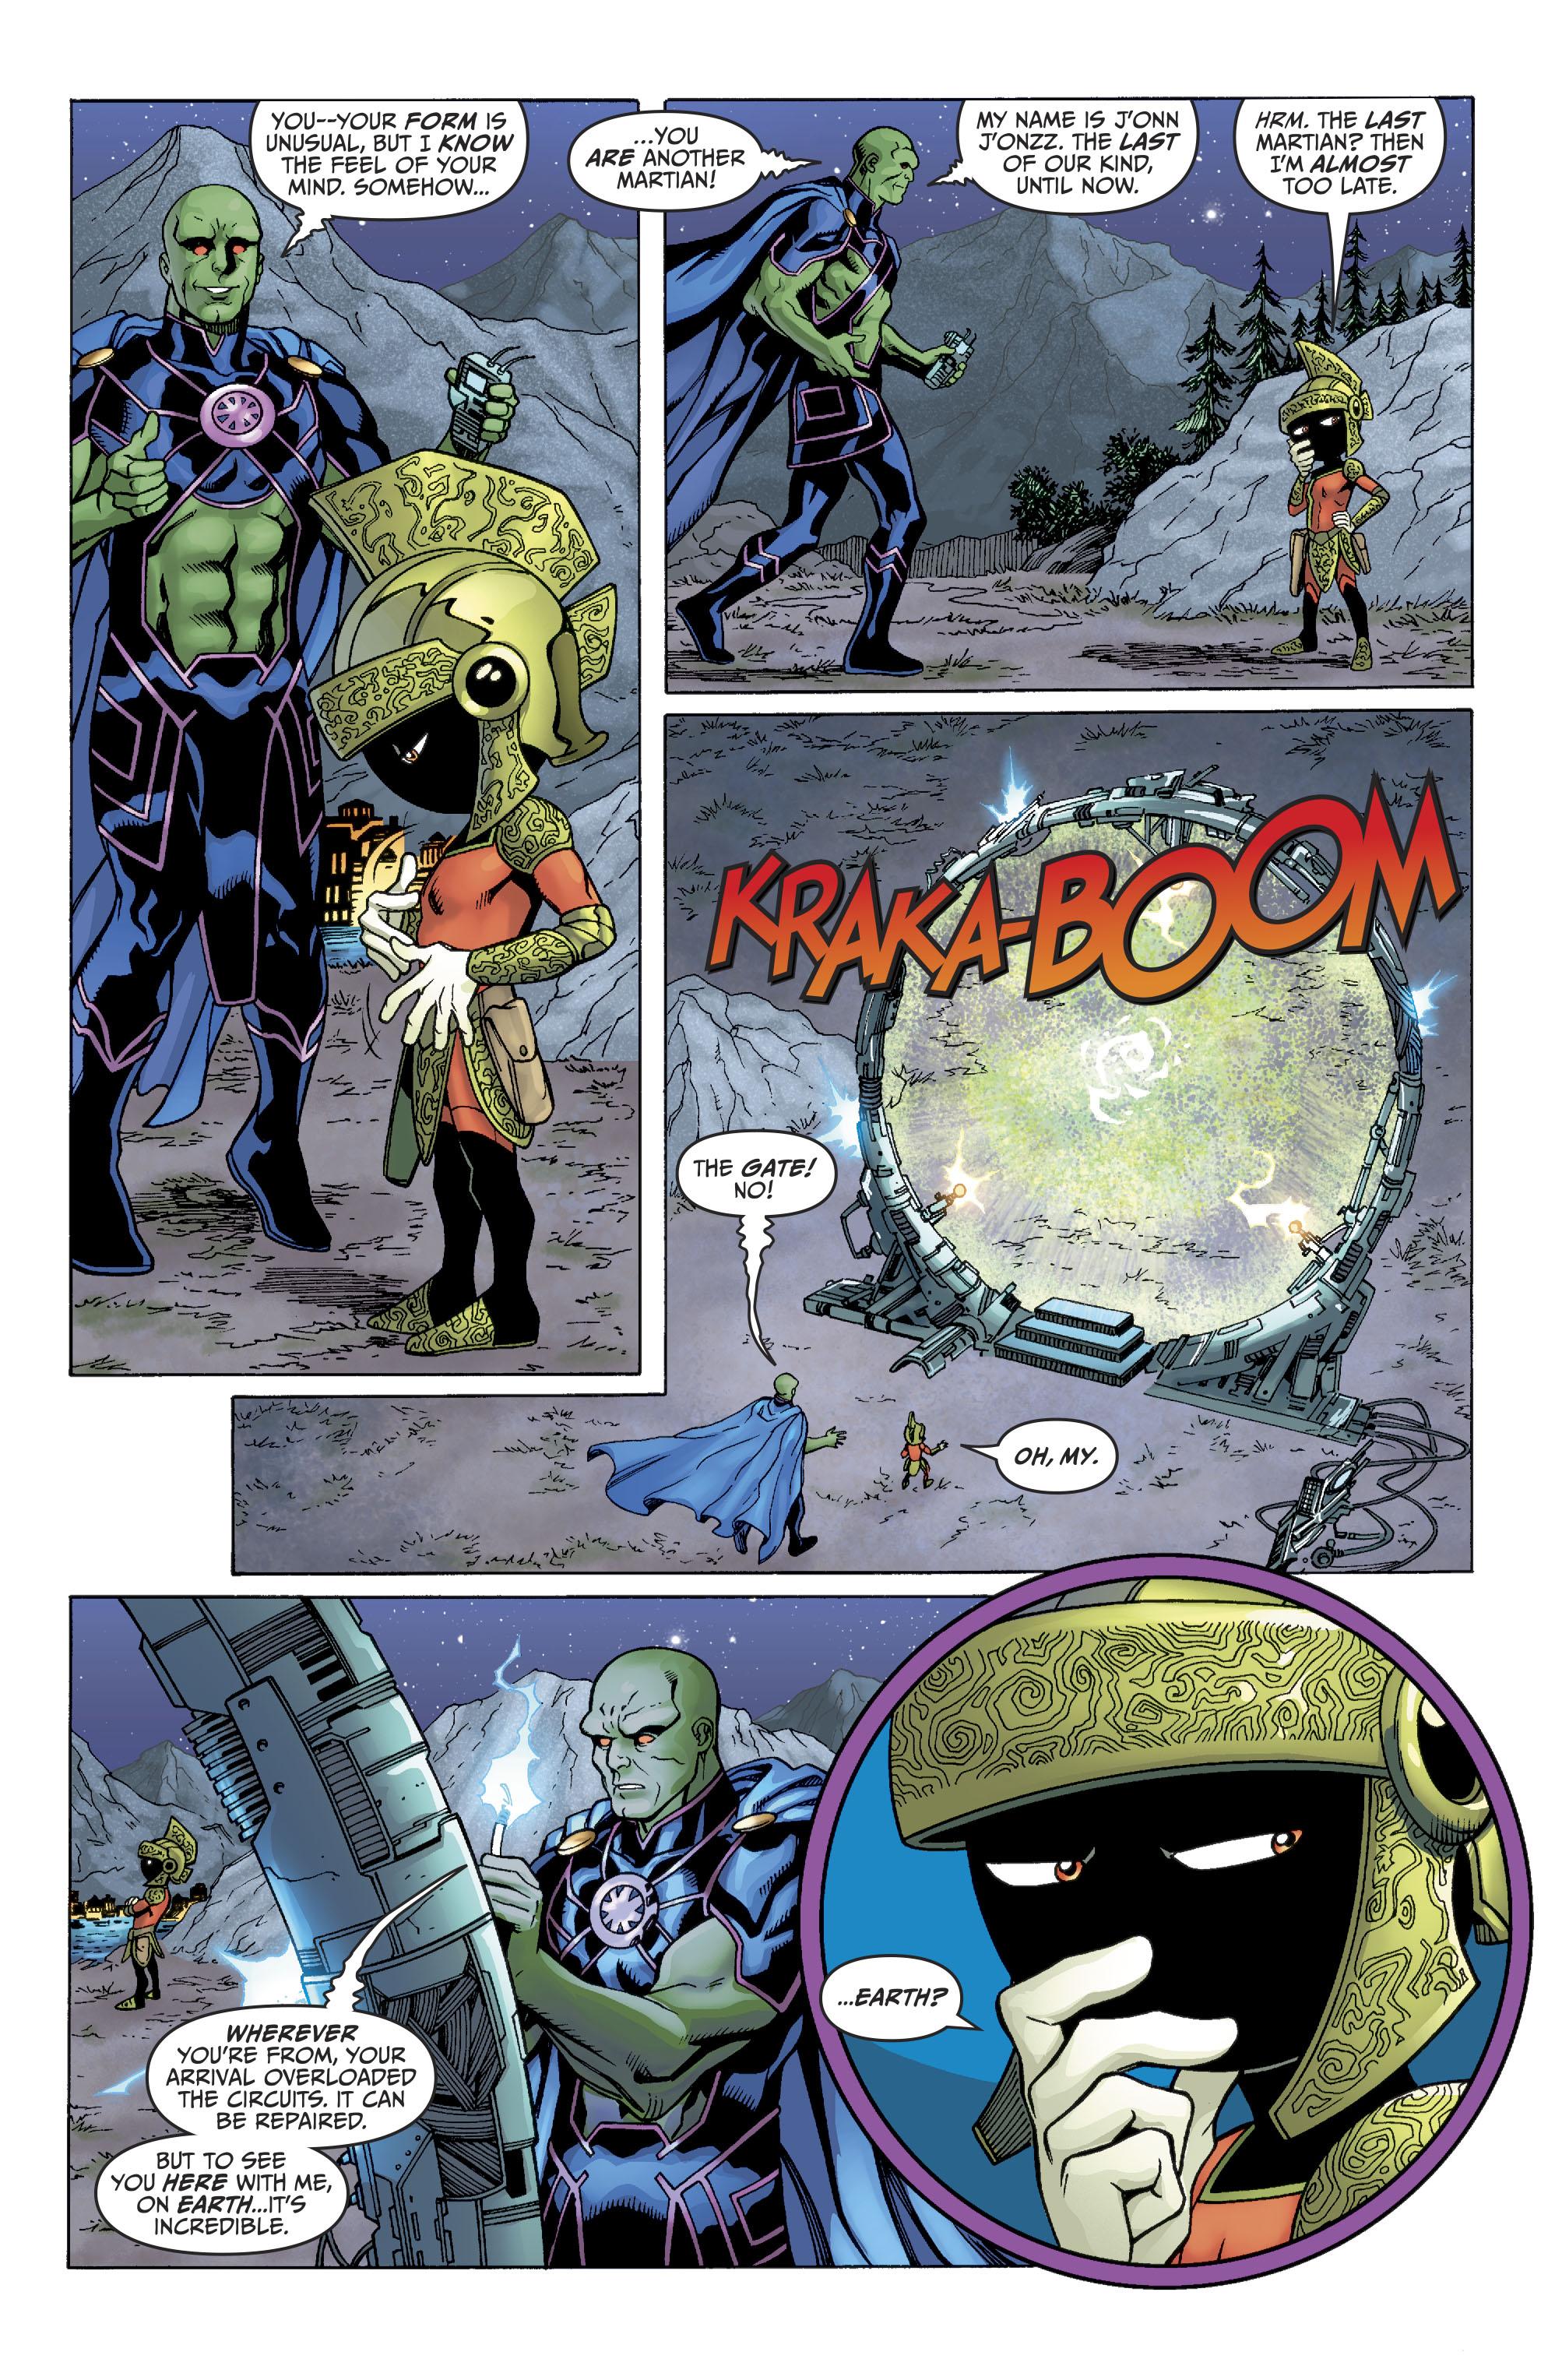 Read online Martian Manhunter/Marvin the Martian Special comic -  Issue # Full - 8